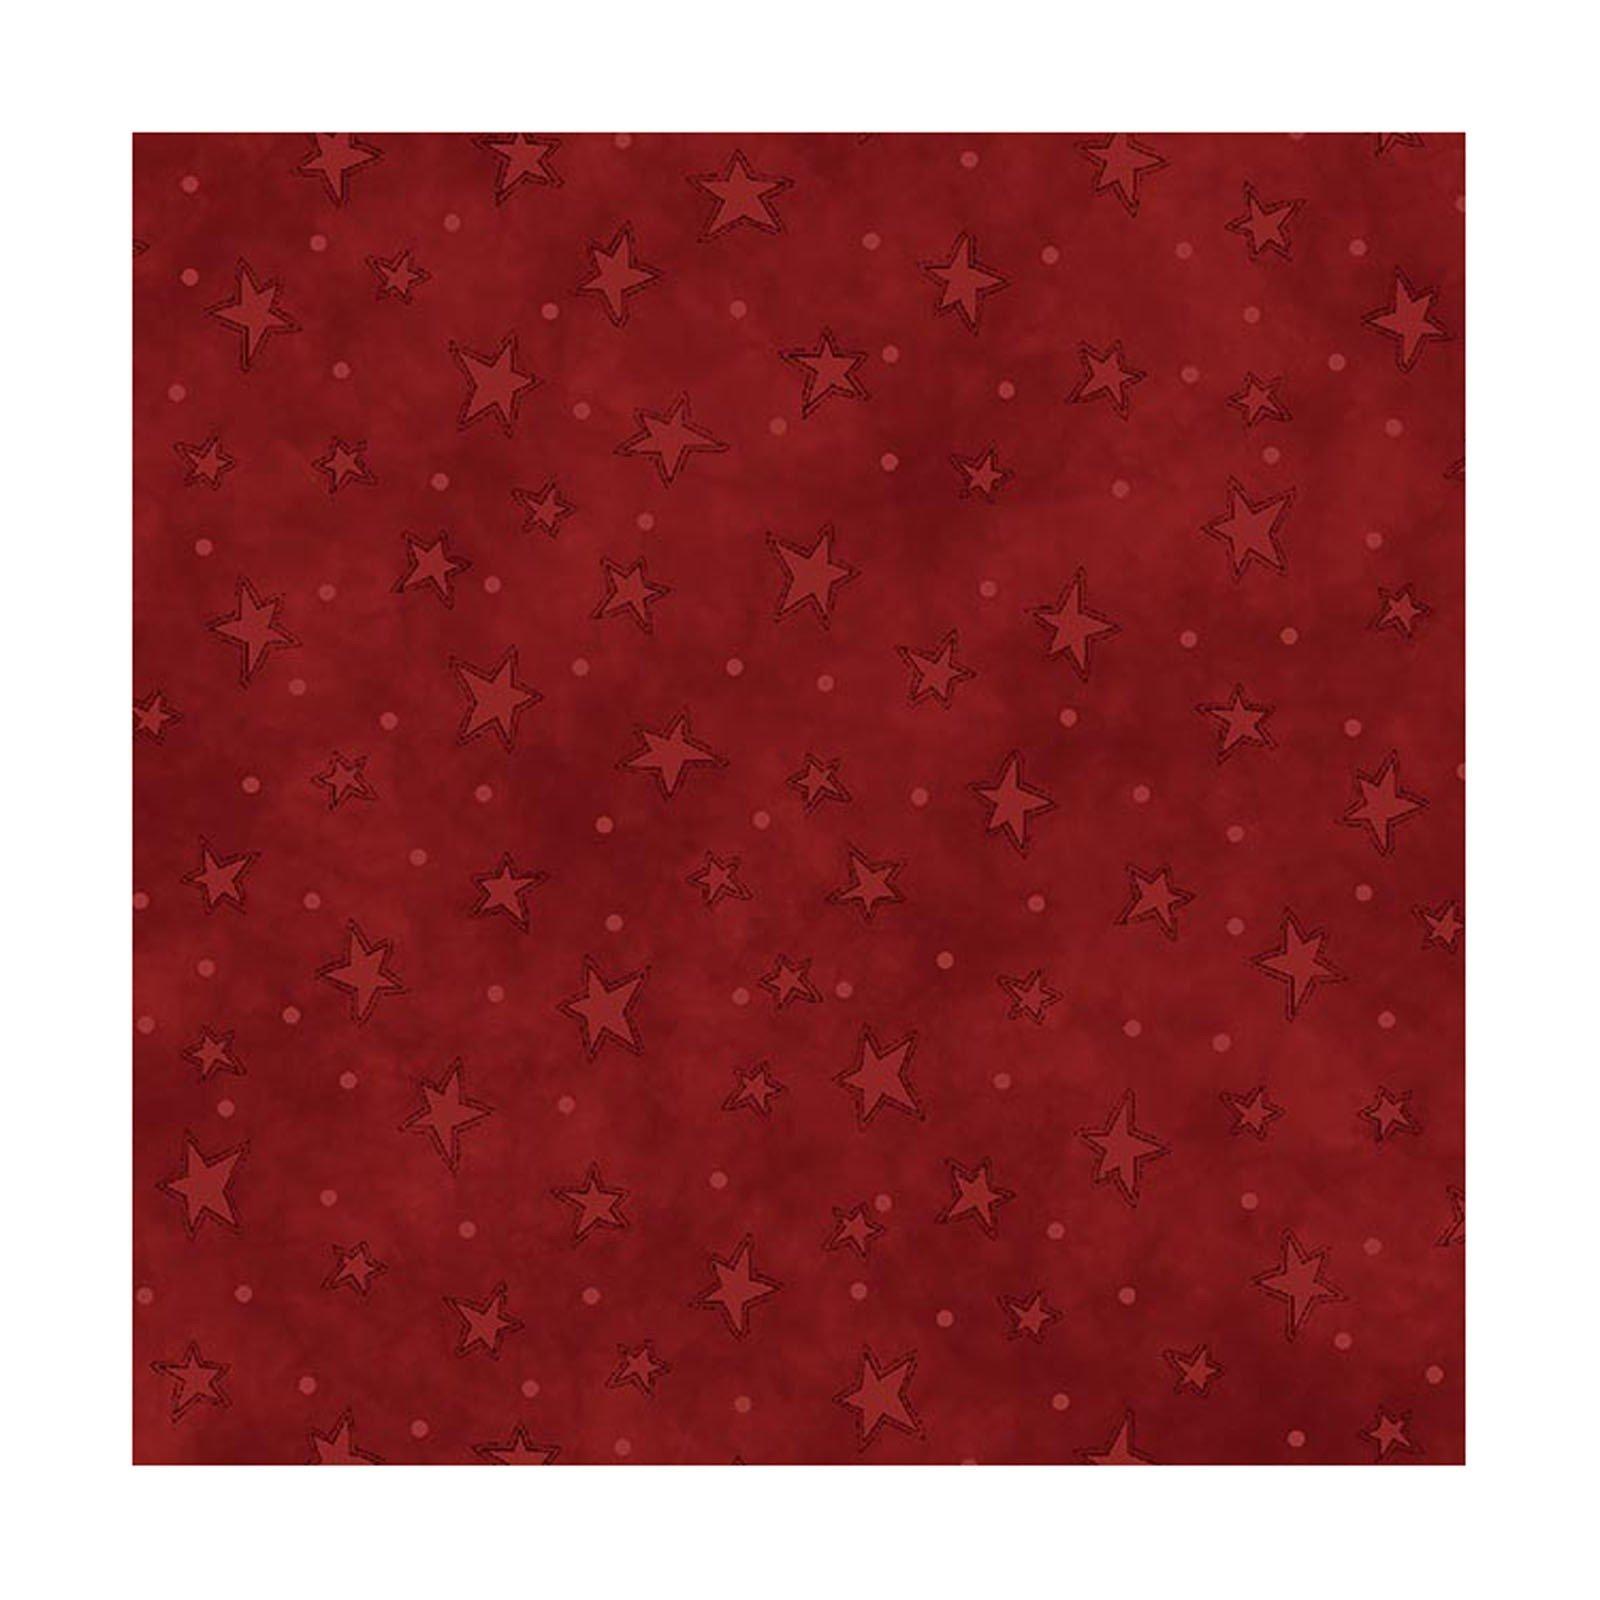 Starry Basics - Red FQ<br/>Henry Glass 8294-88